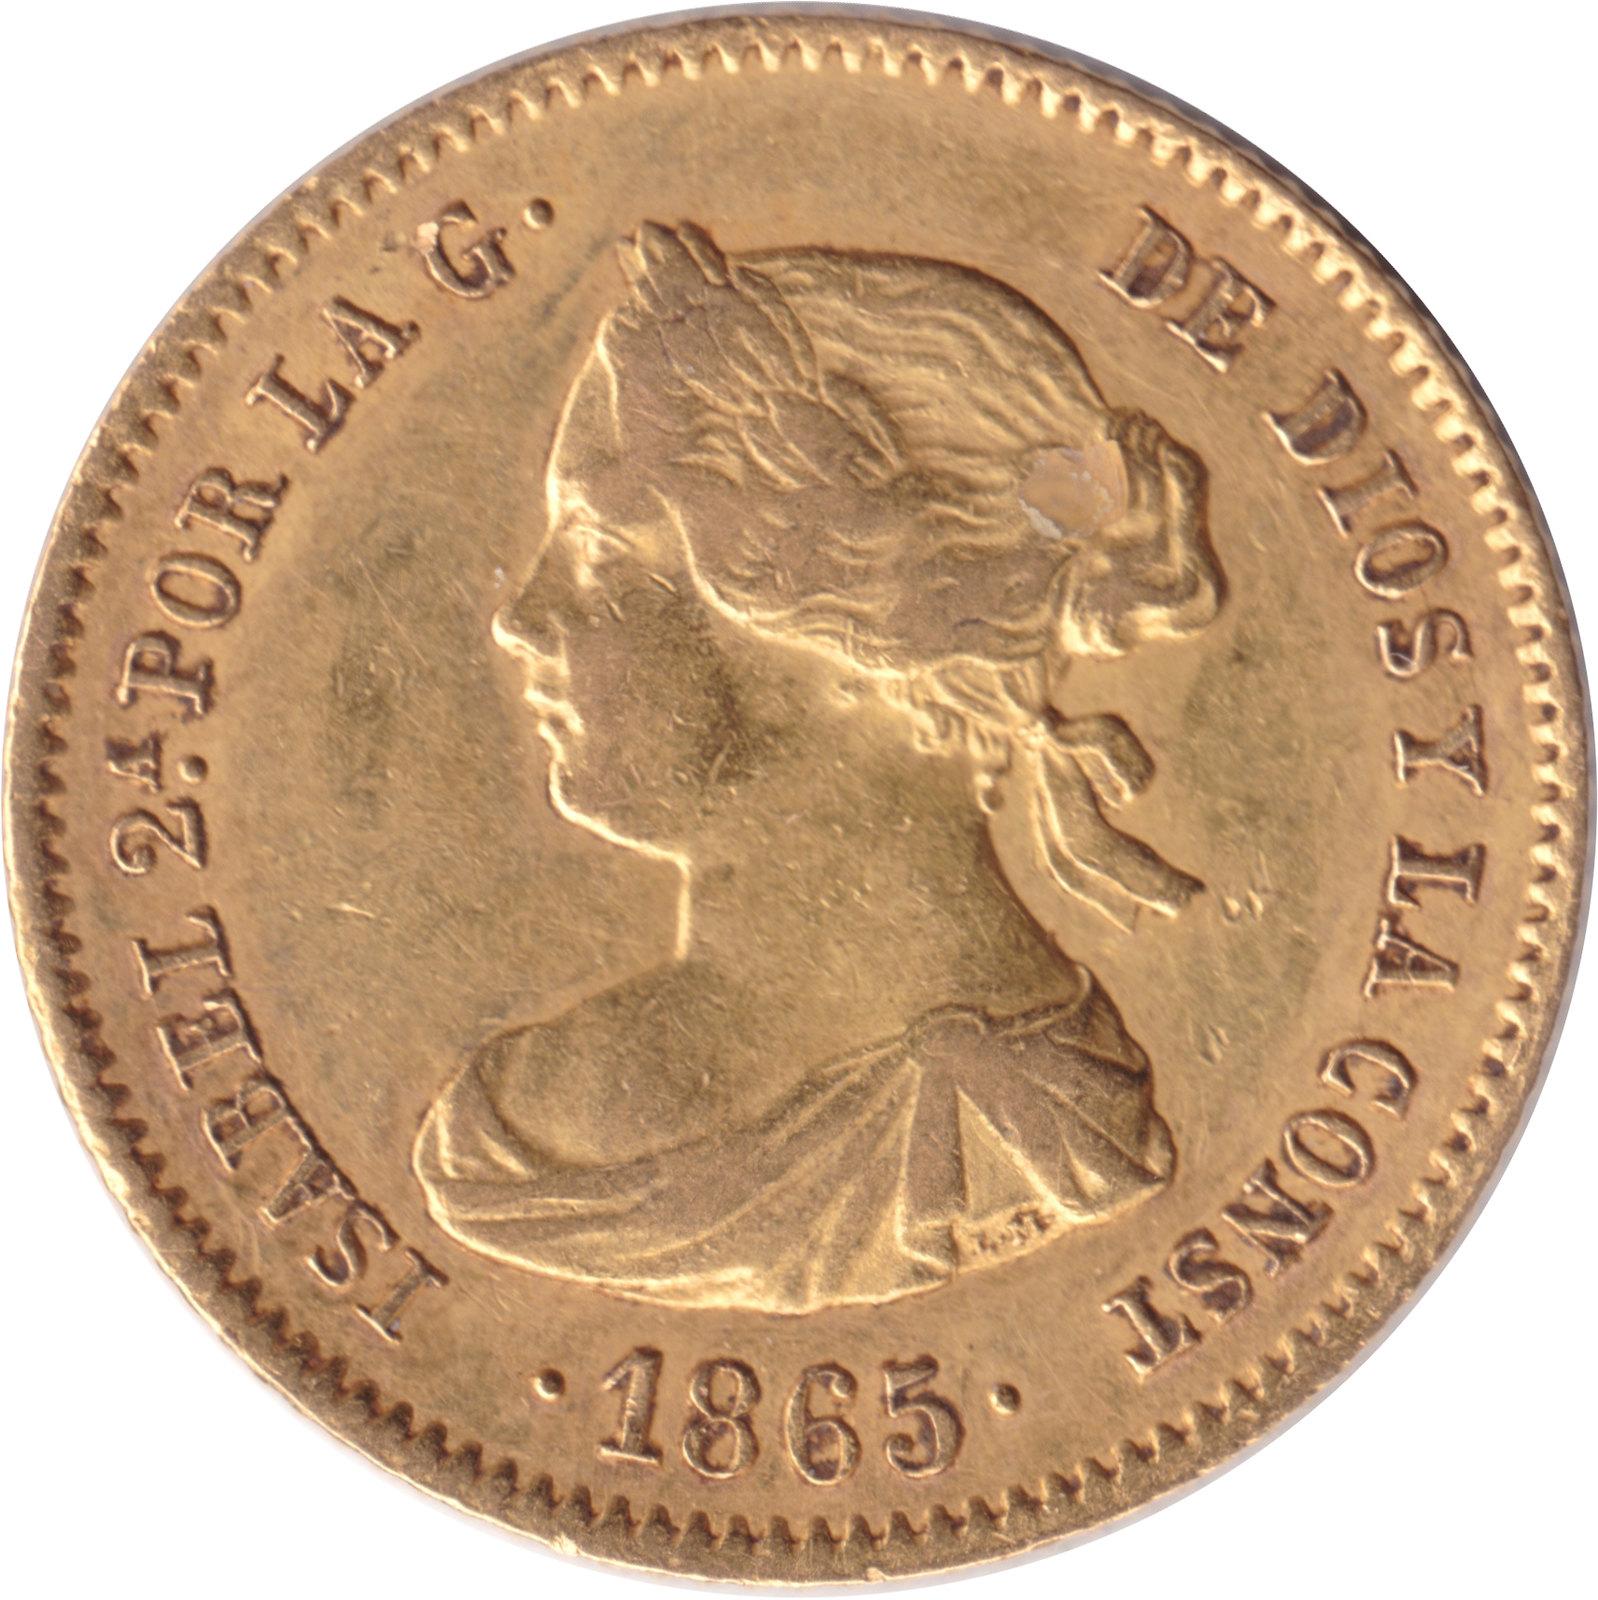 4 Escudos Isabel II 1865 (subasta Cayon 24 abril)  8683598498_f1ac40bc5a_h